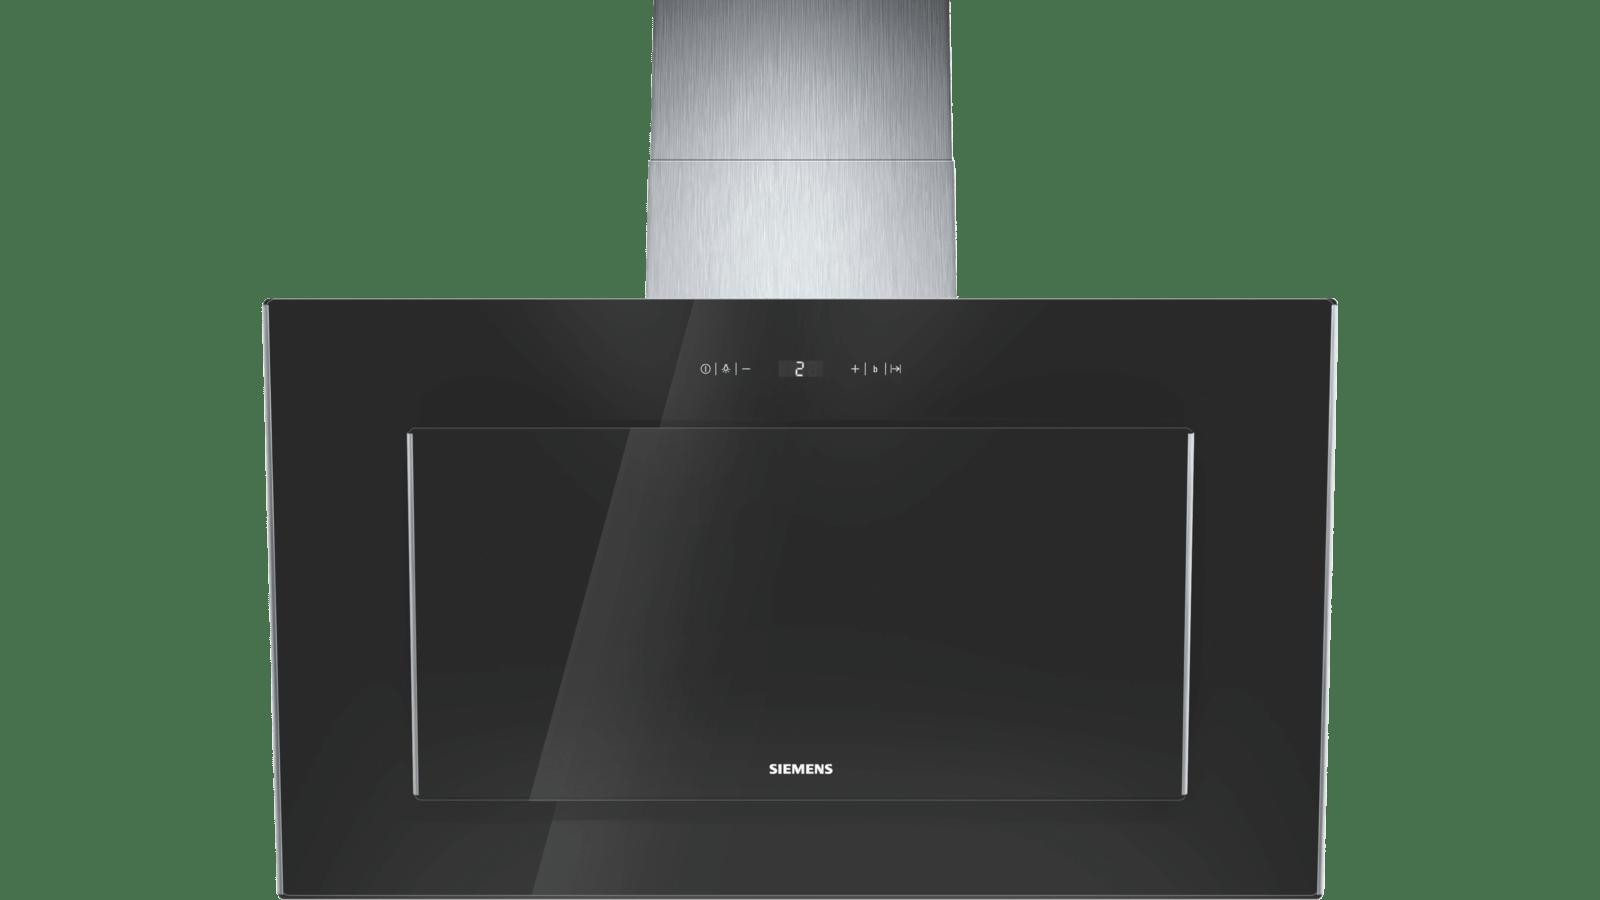 Siemens Dunstabzugshaube Filter Reset 2021